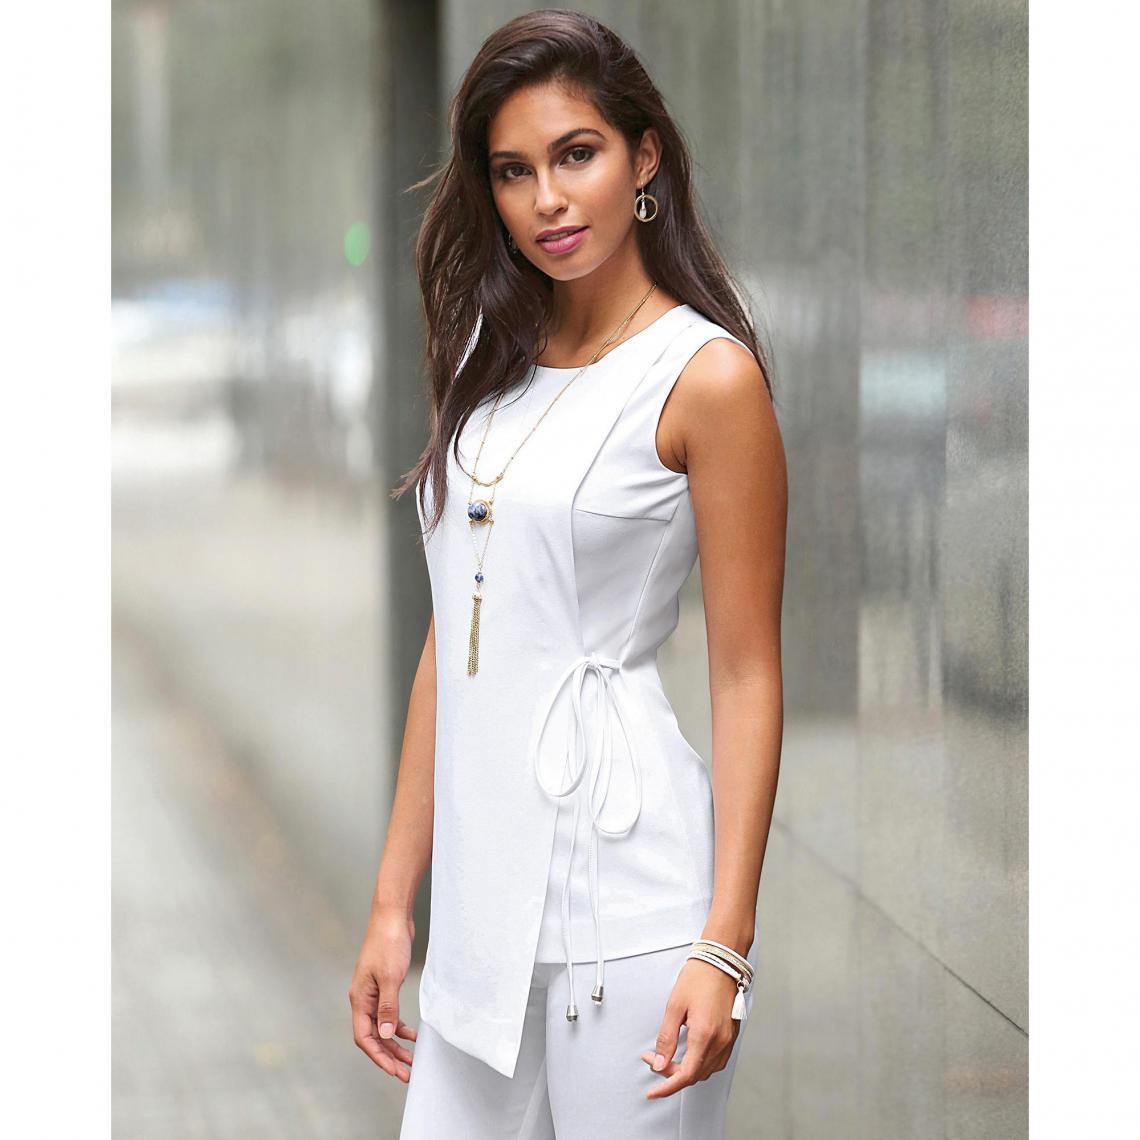 f72e38ad462 Tee-shirt sans manches effet cache-coeur femme - Blanc 3 SUISSES Femme